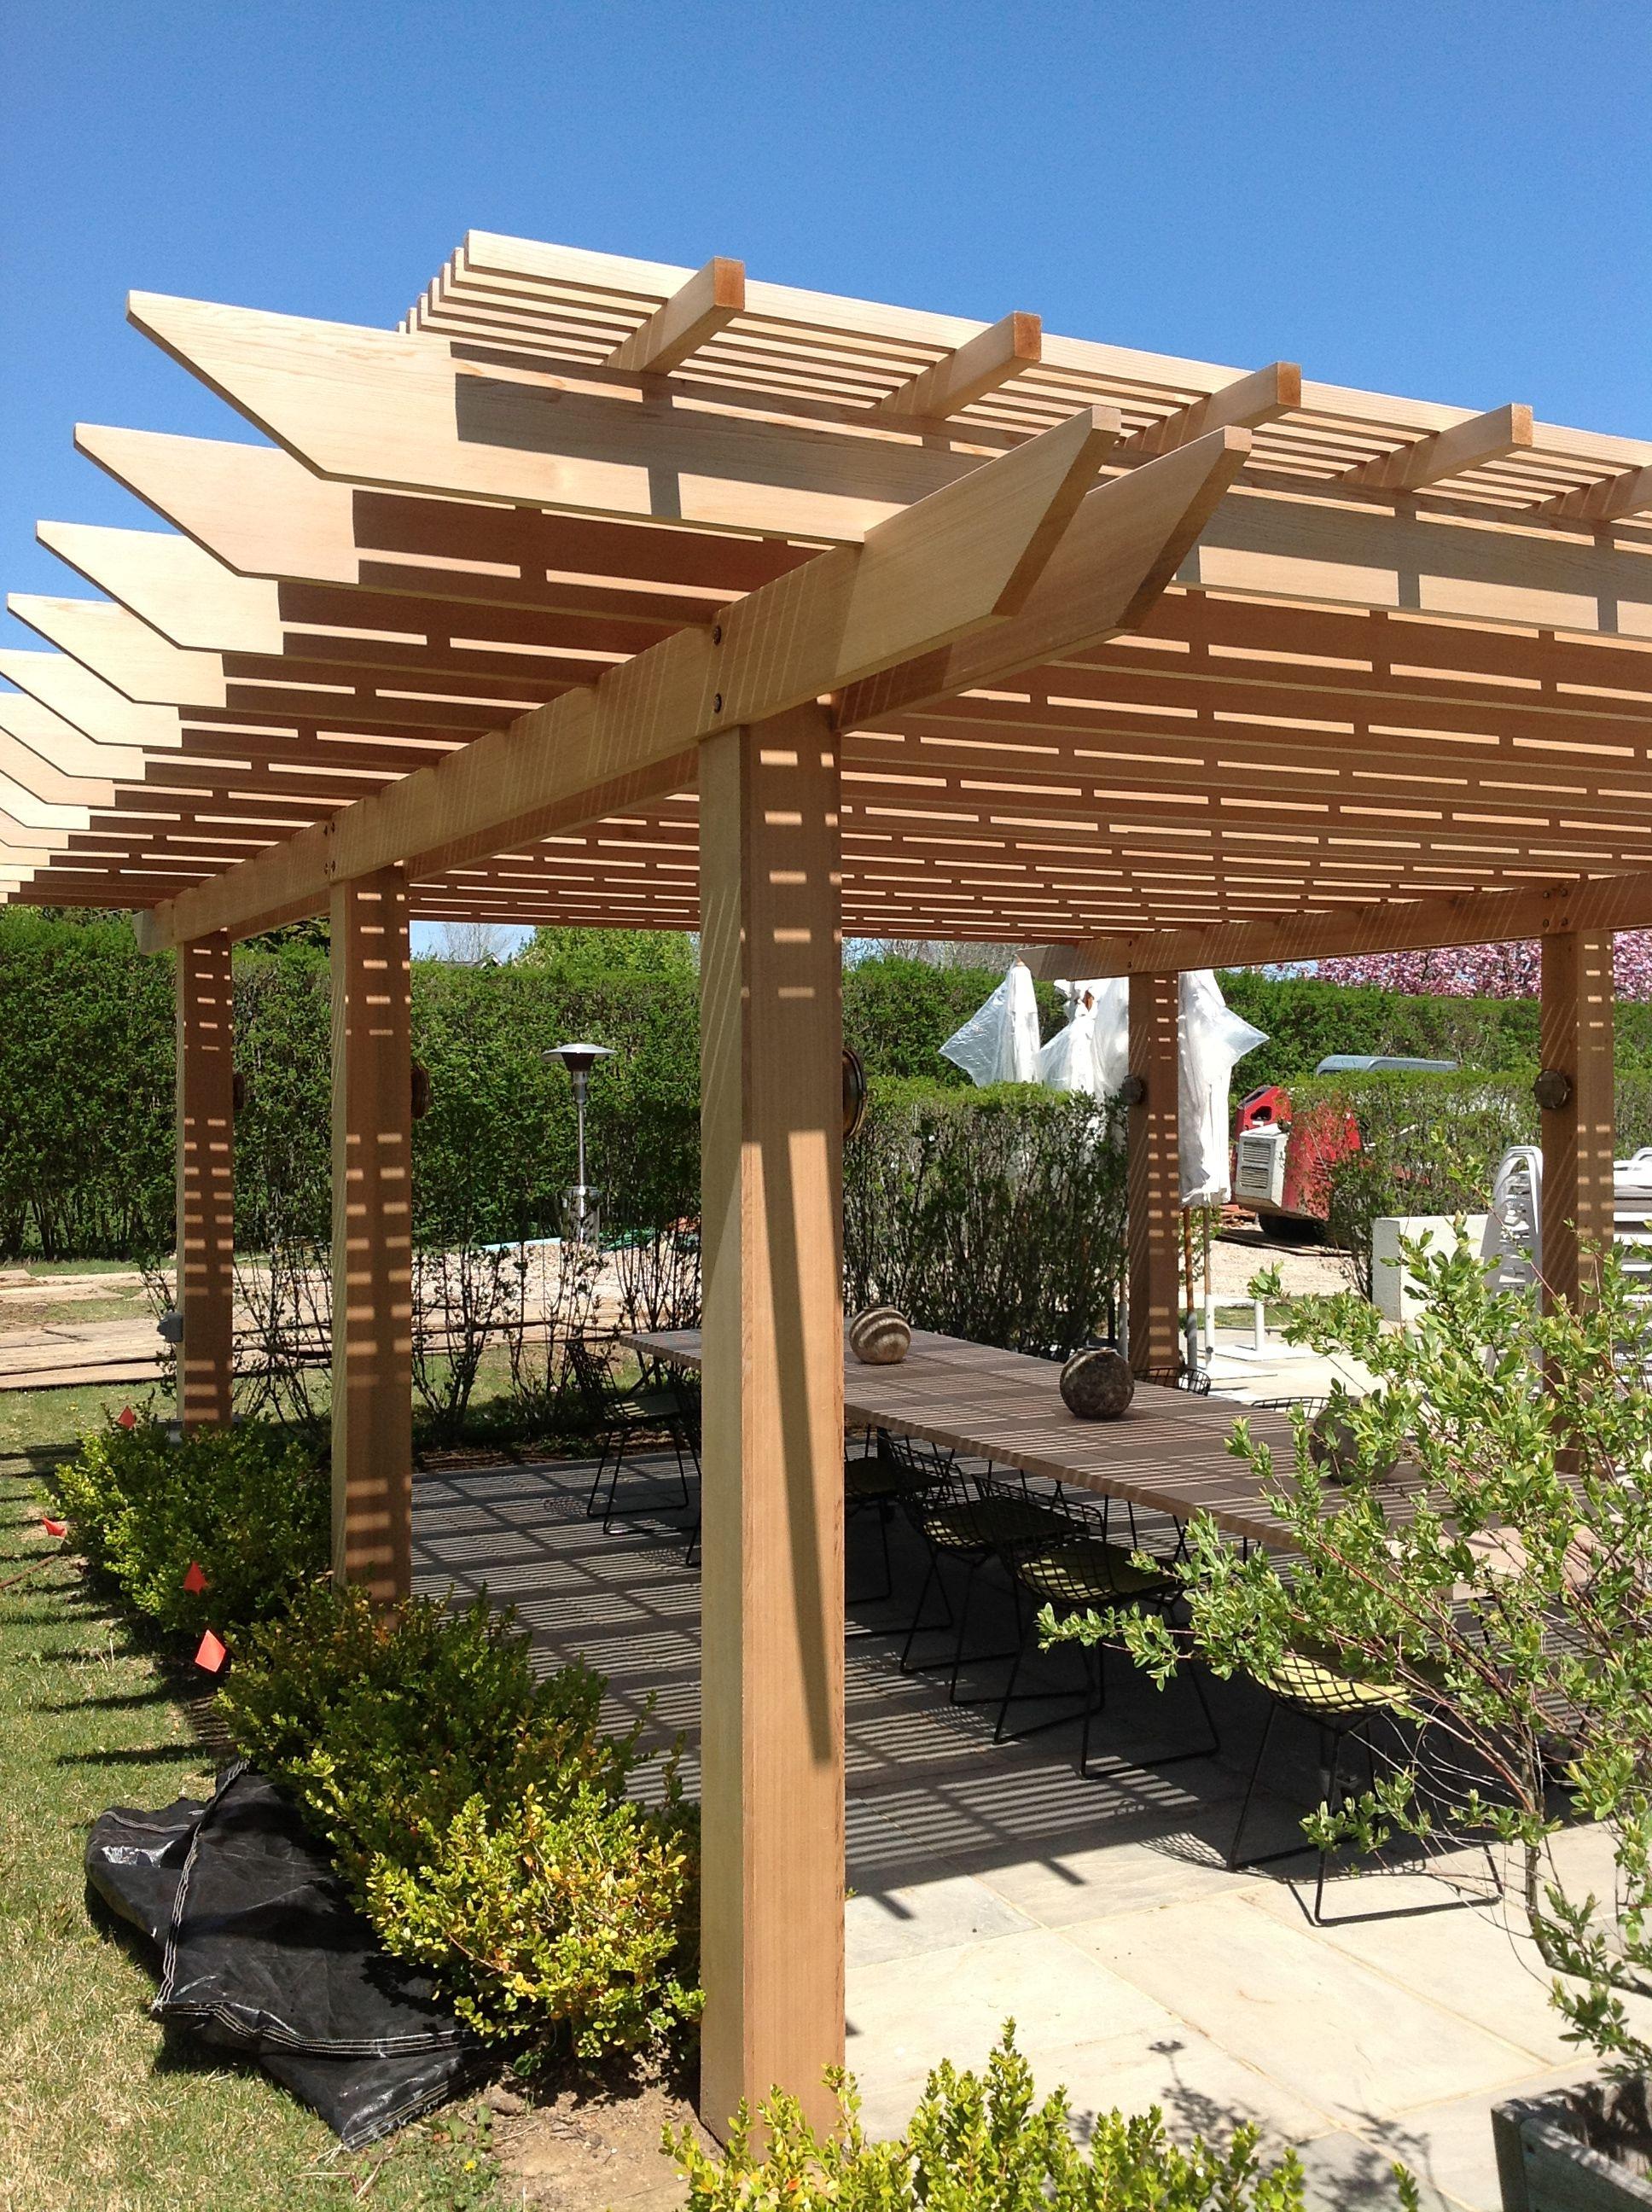 Joe D Urso Pergola Pergola Backyard Outdoor Structures